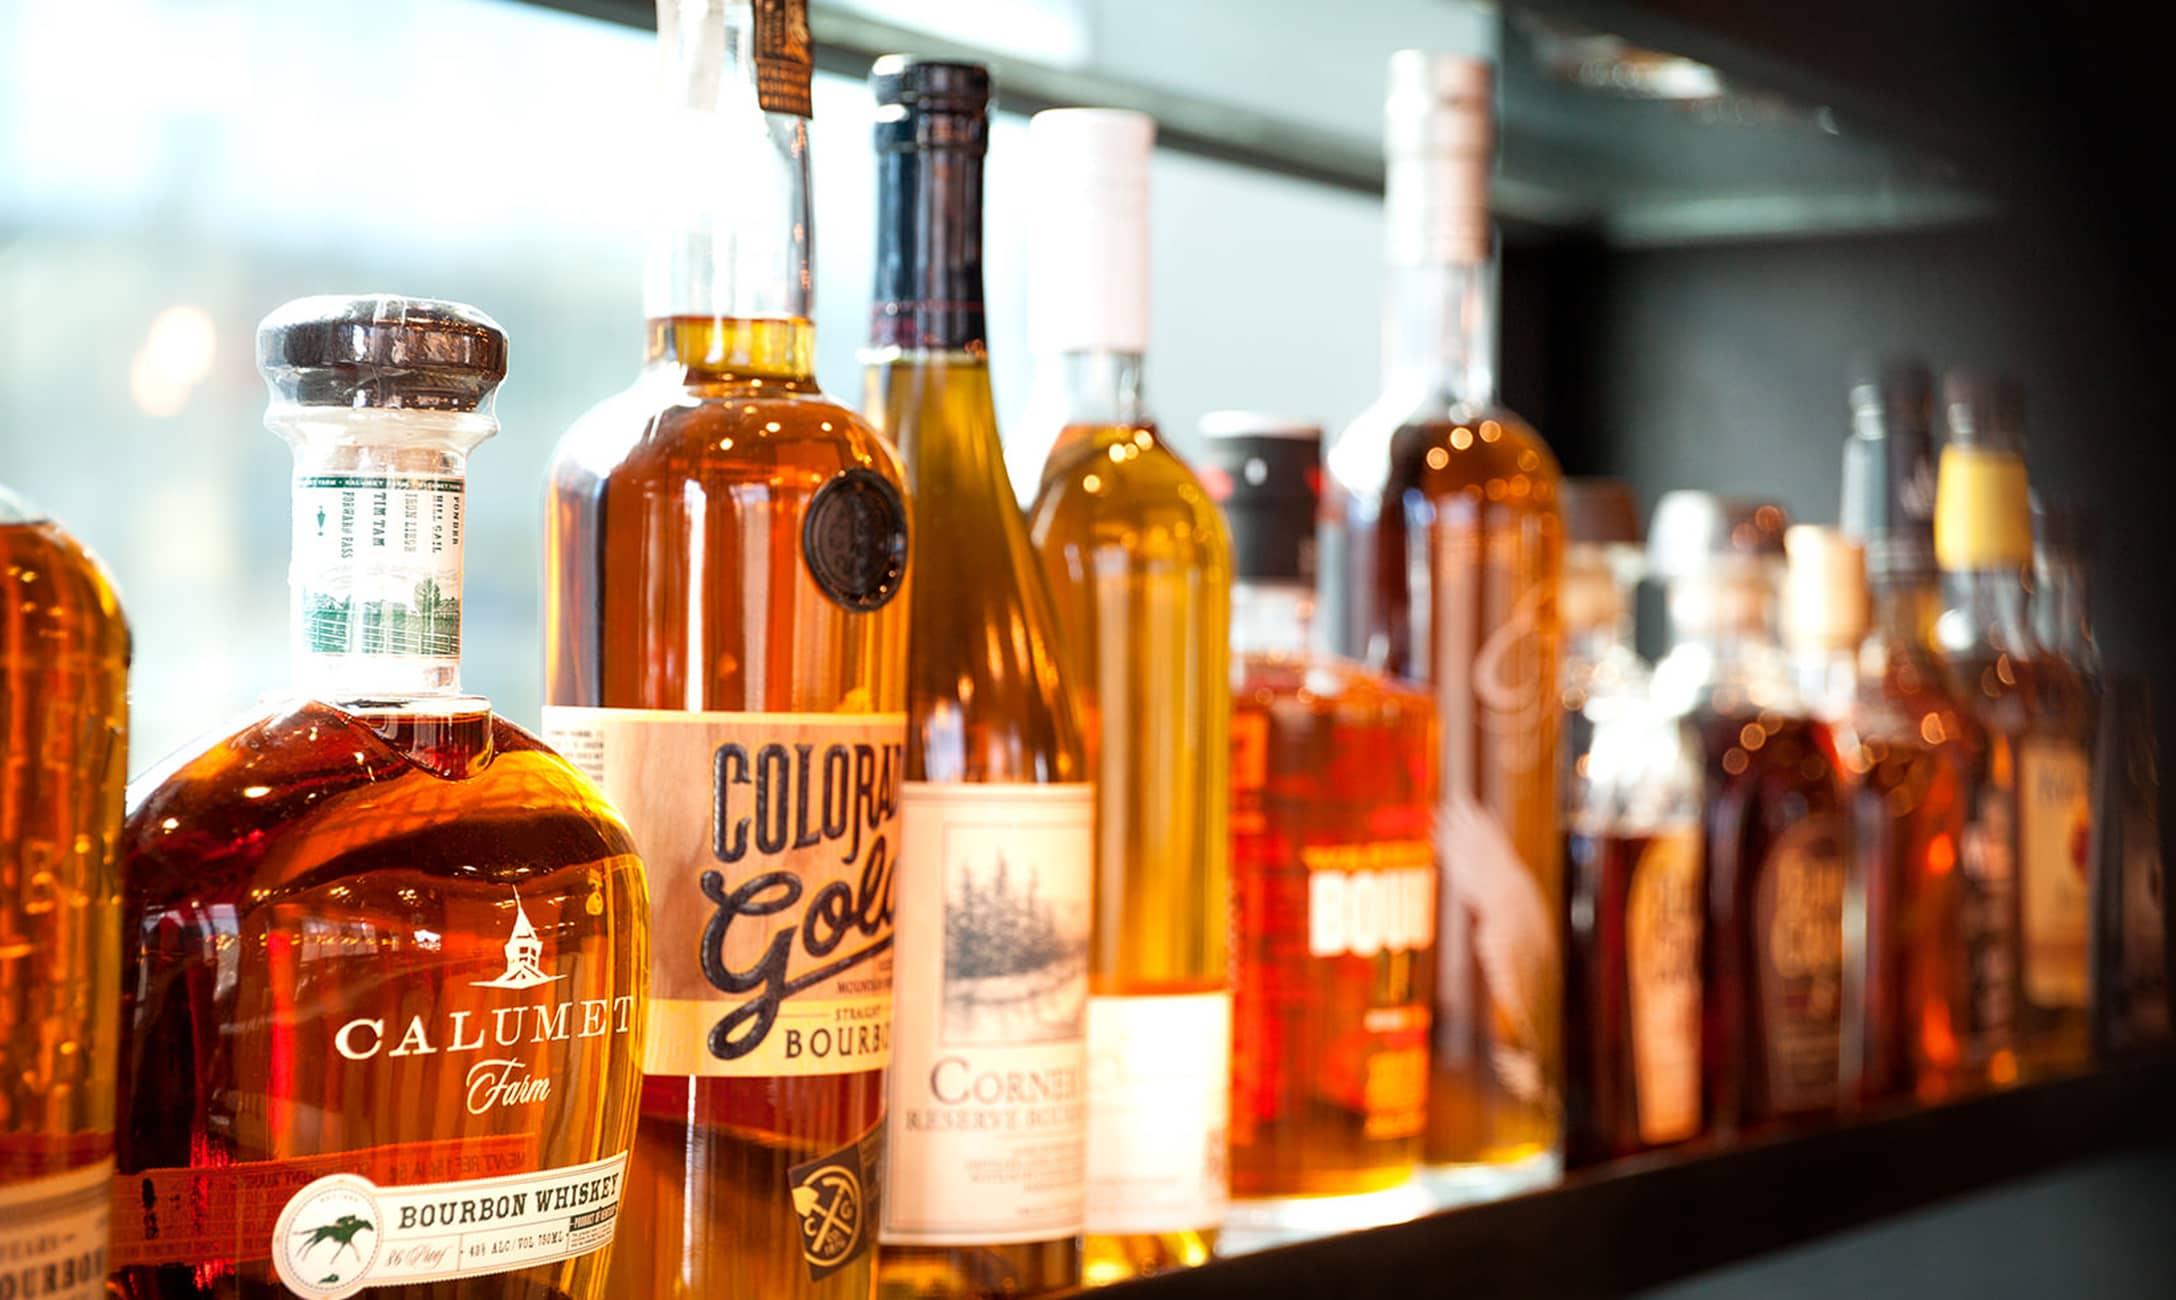 Hearth & Dram whiskey bottles on shelf